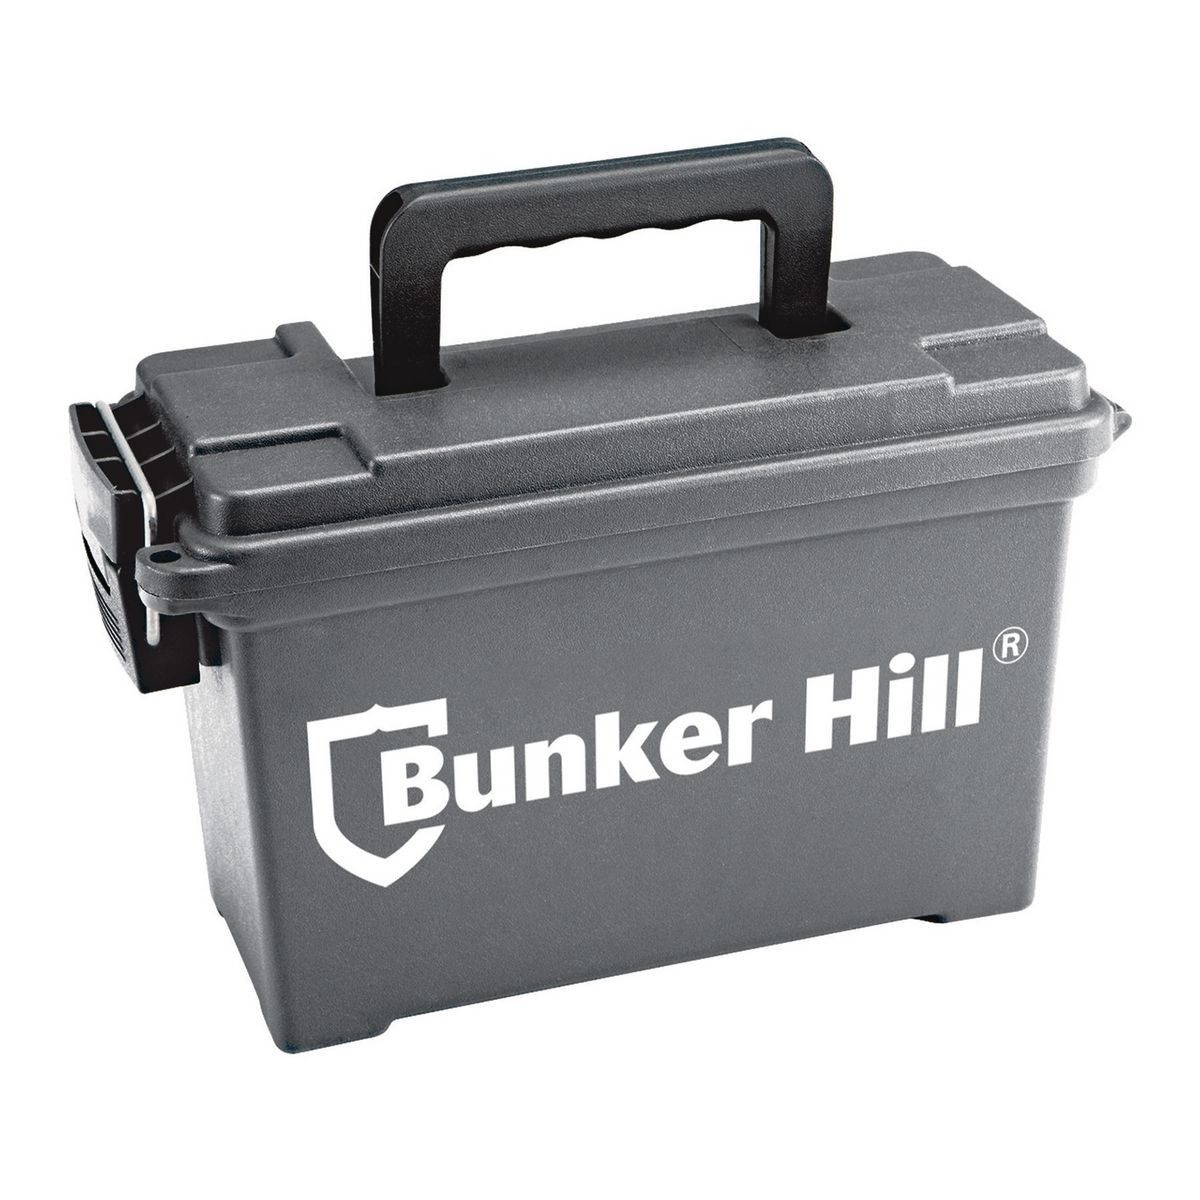 Ammo Dry Box in 2020 Harbor freight tools, Ammo box